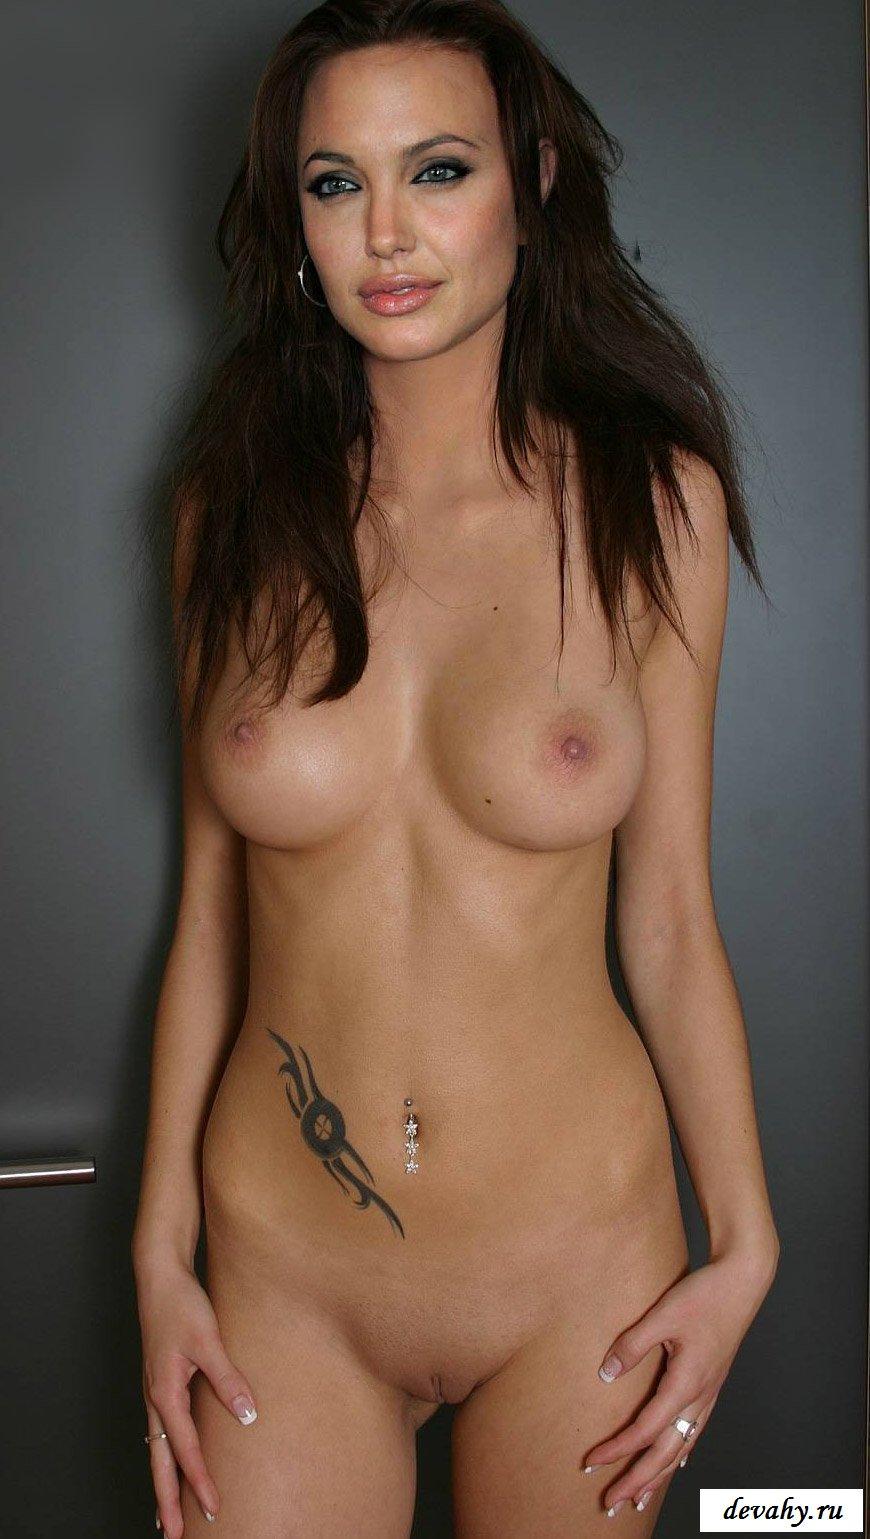 Angelina Jolie Голая Обнаженная Анджелина Джоли фото